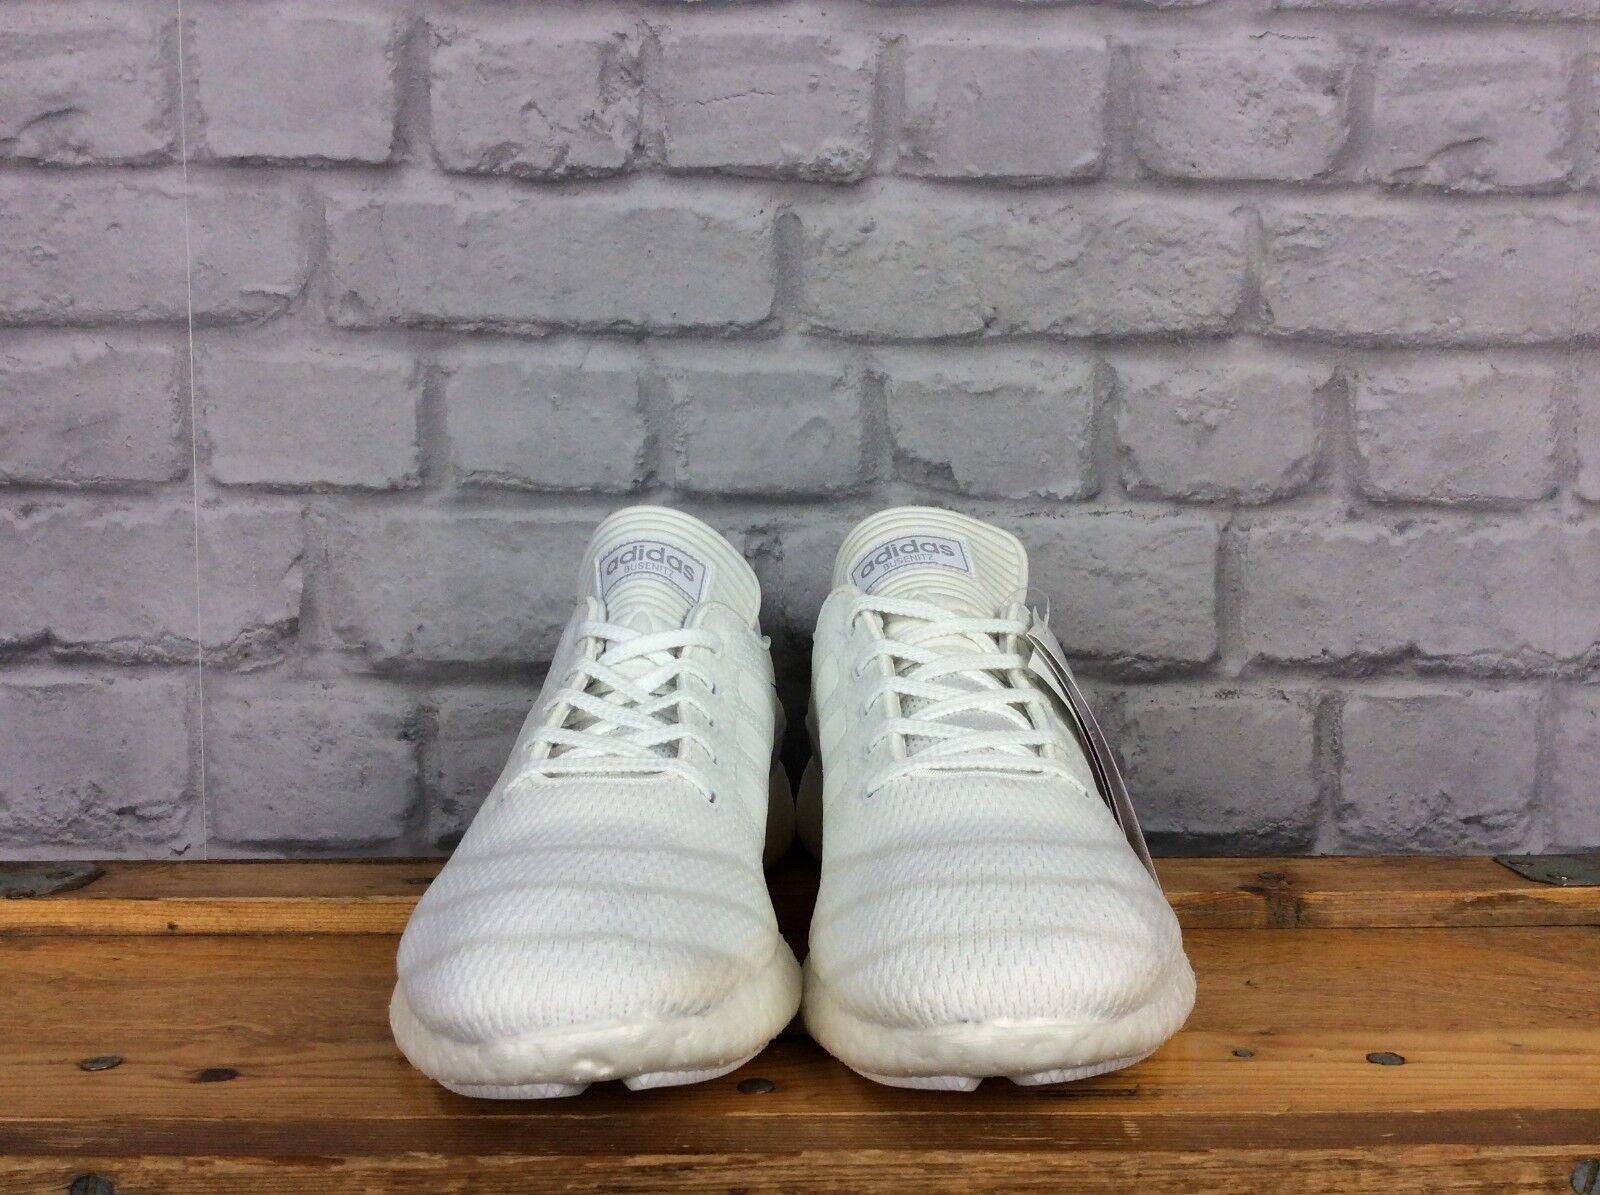 ADIDAS Reino Reino Reino Unido para hombre 7 UE 40 2 3 ULTRA BOOST BUSENITZ Primeknit blancooo Zapatillas a2fc06